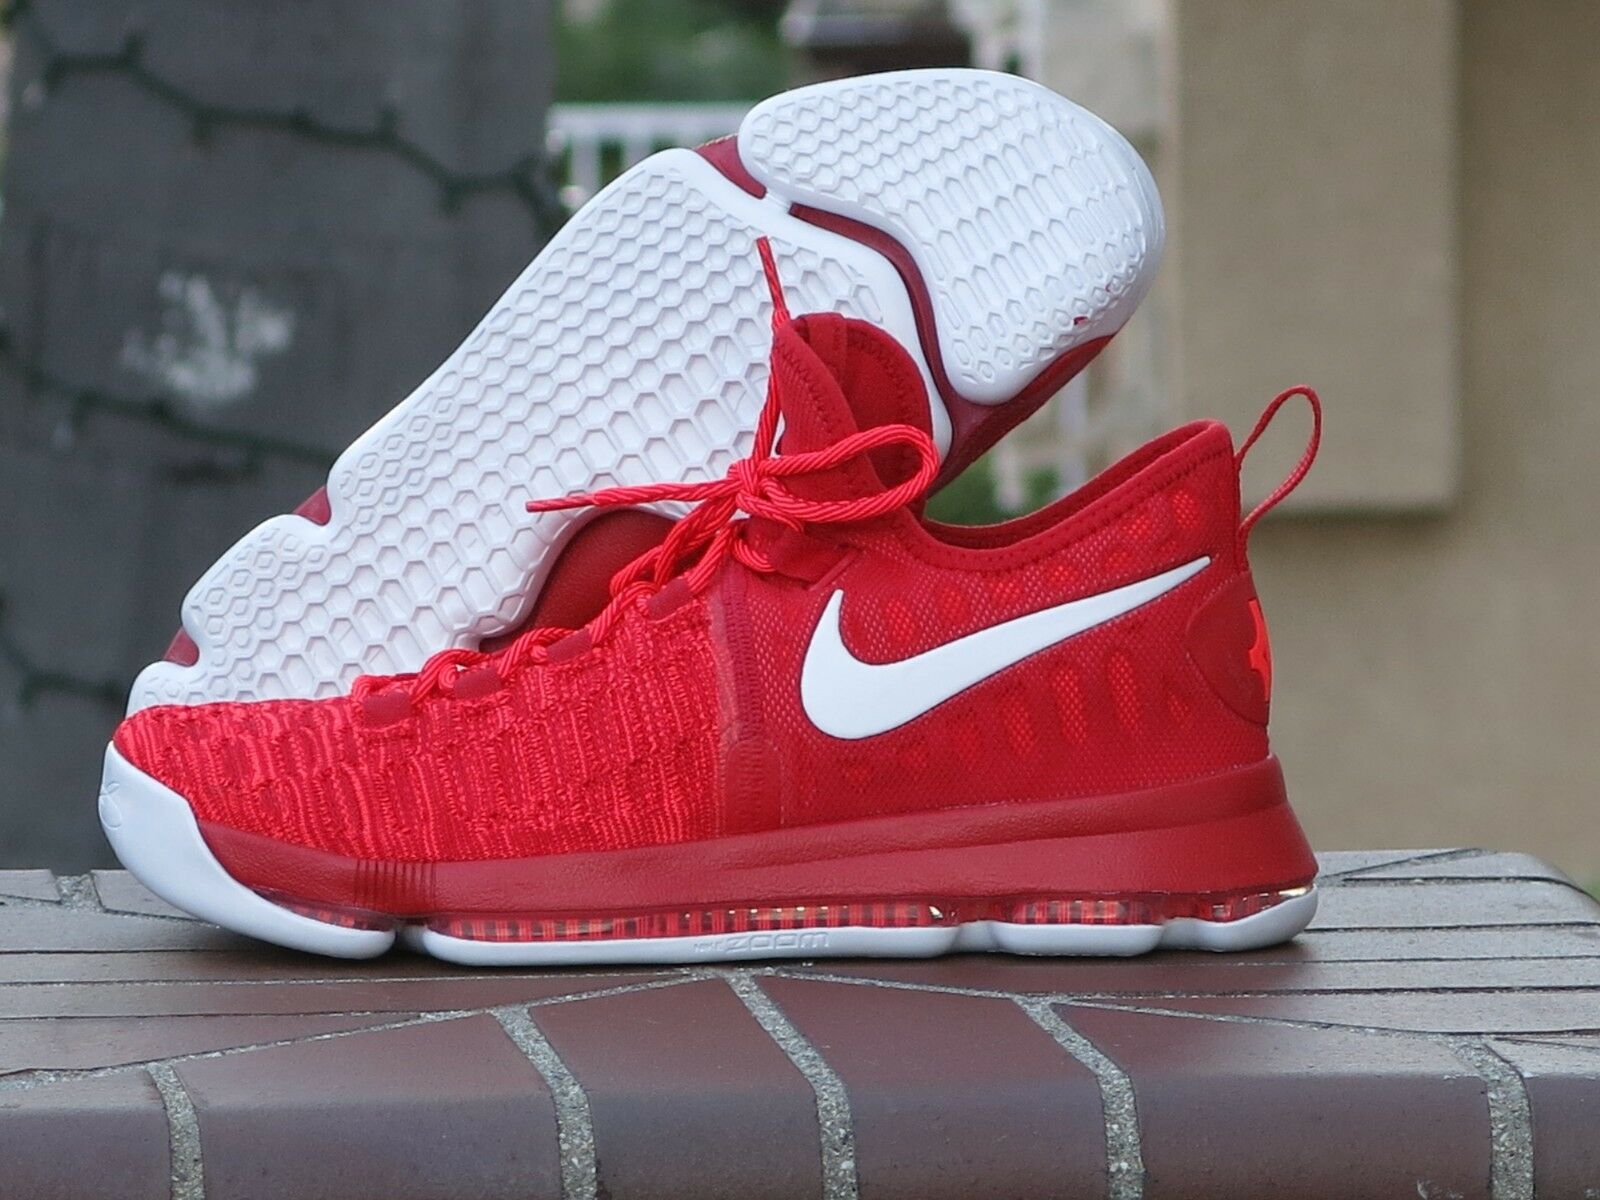 Nike KD 9 IX Men's Basketball Sneakers 843392-611